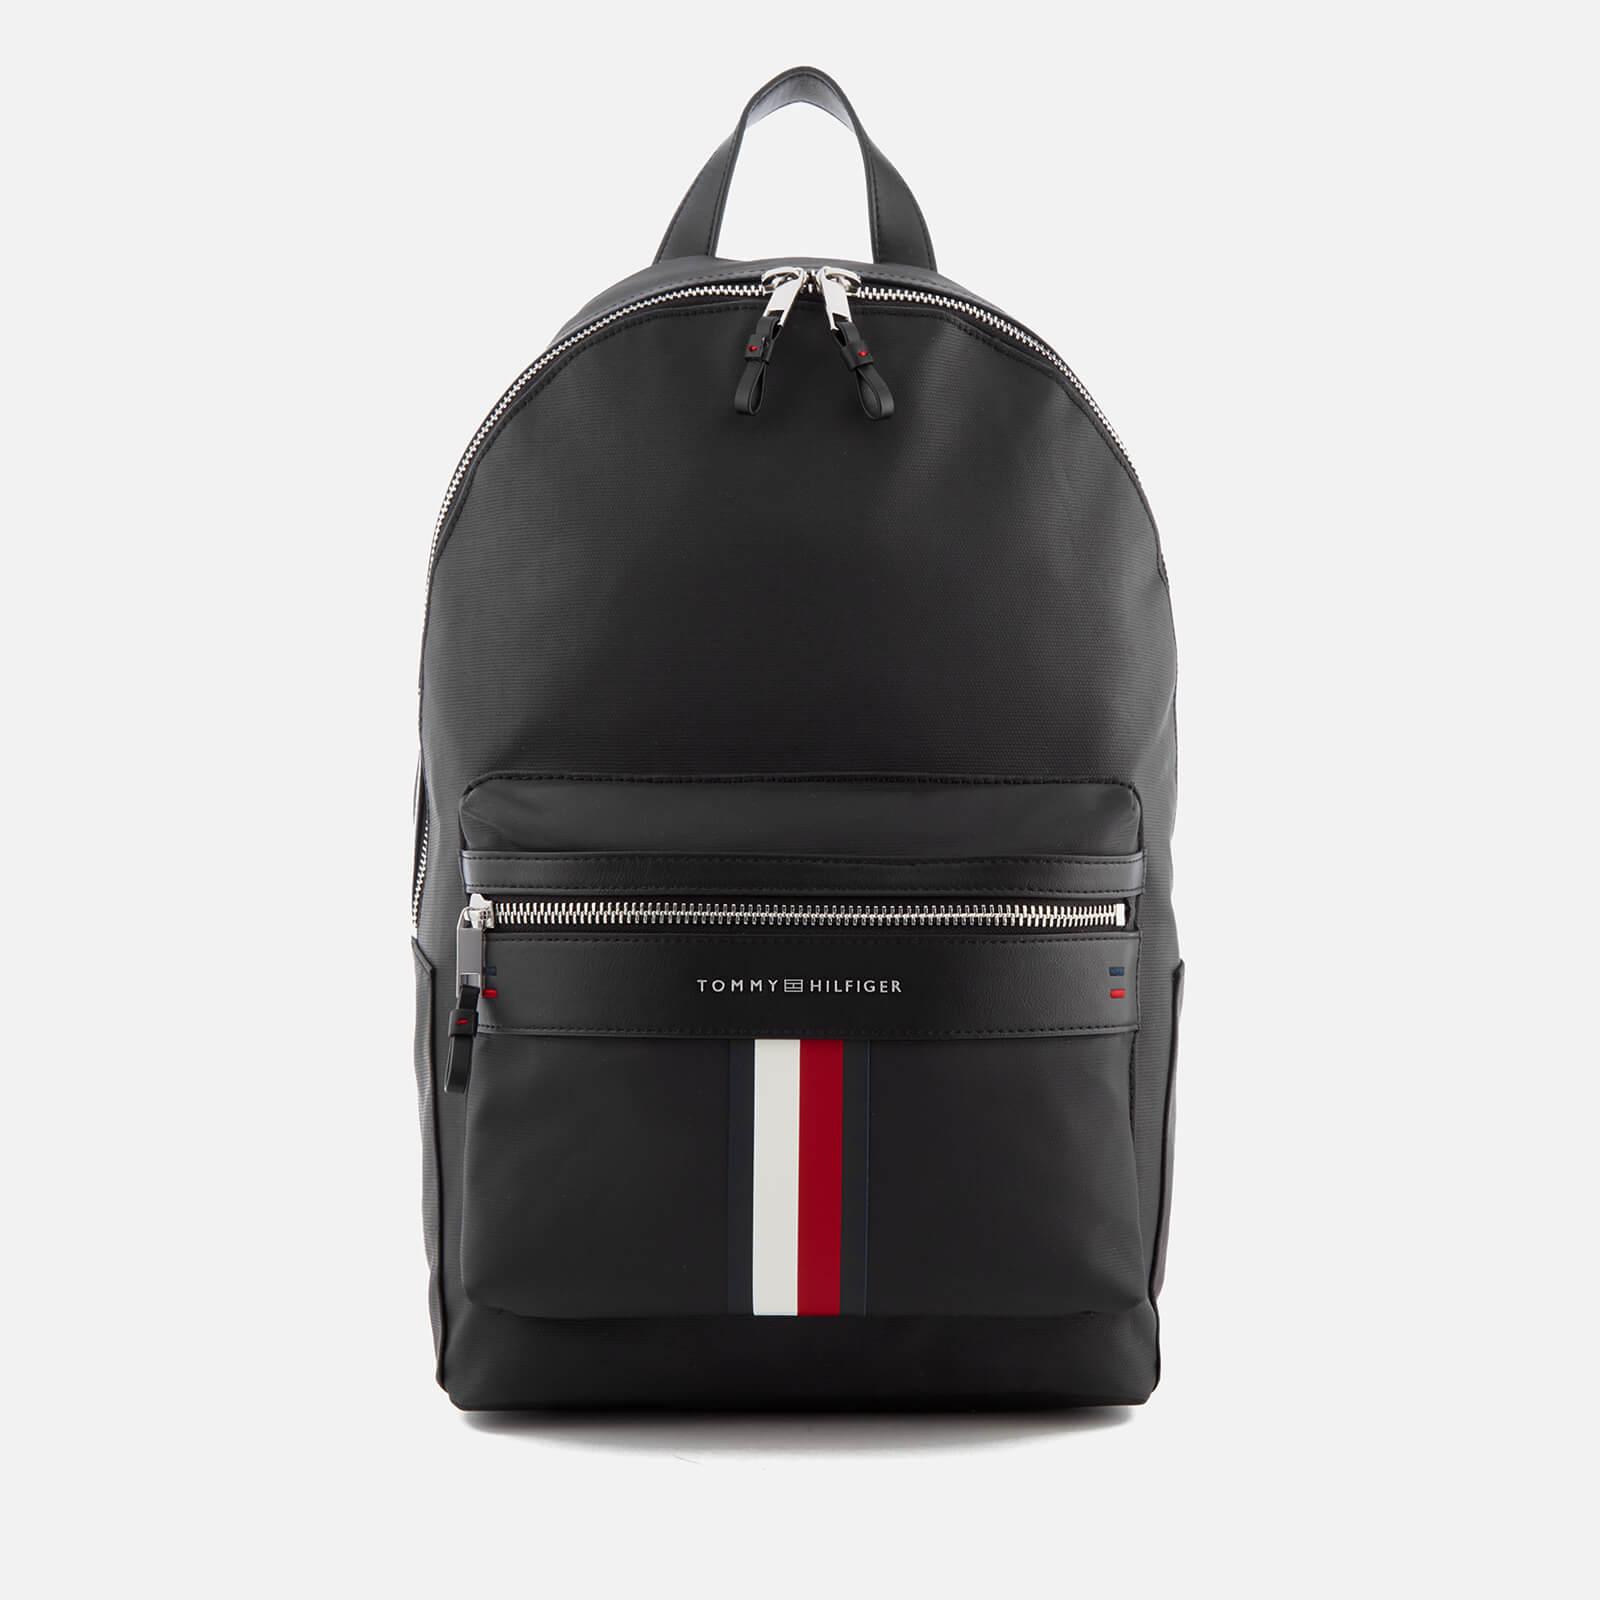 4e6353601 Tommy Hilfiger Men's Elevated Backpack - Black Clothing | TheHut.com